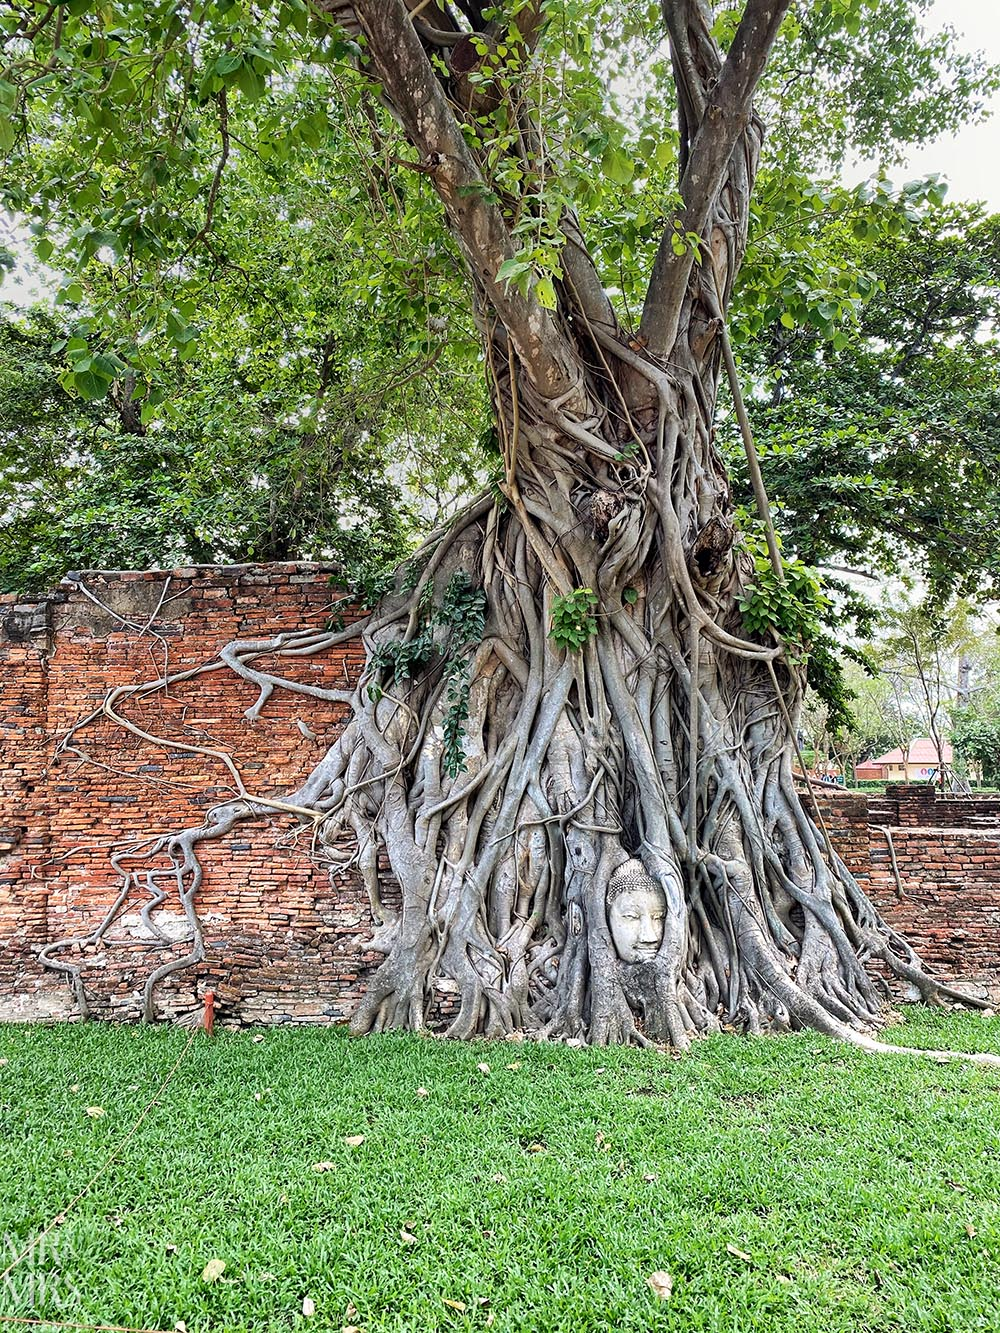 Coronavirus in Thailand - Wat Mahathat Temple - Buddha face in banyan tree